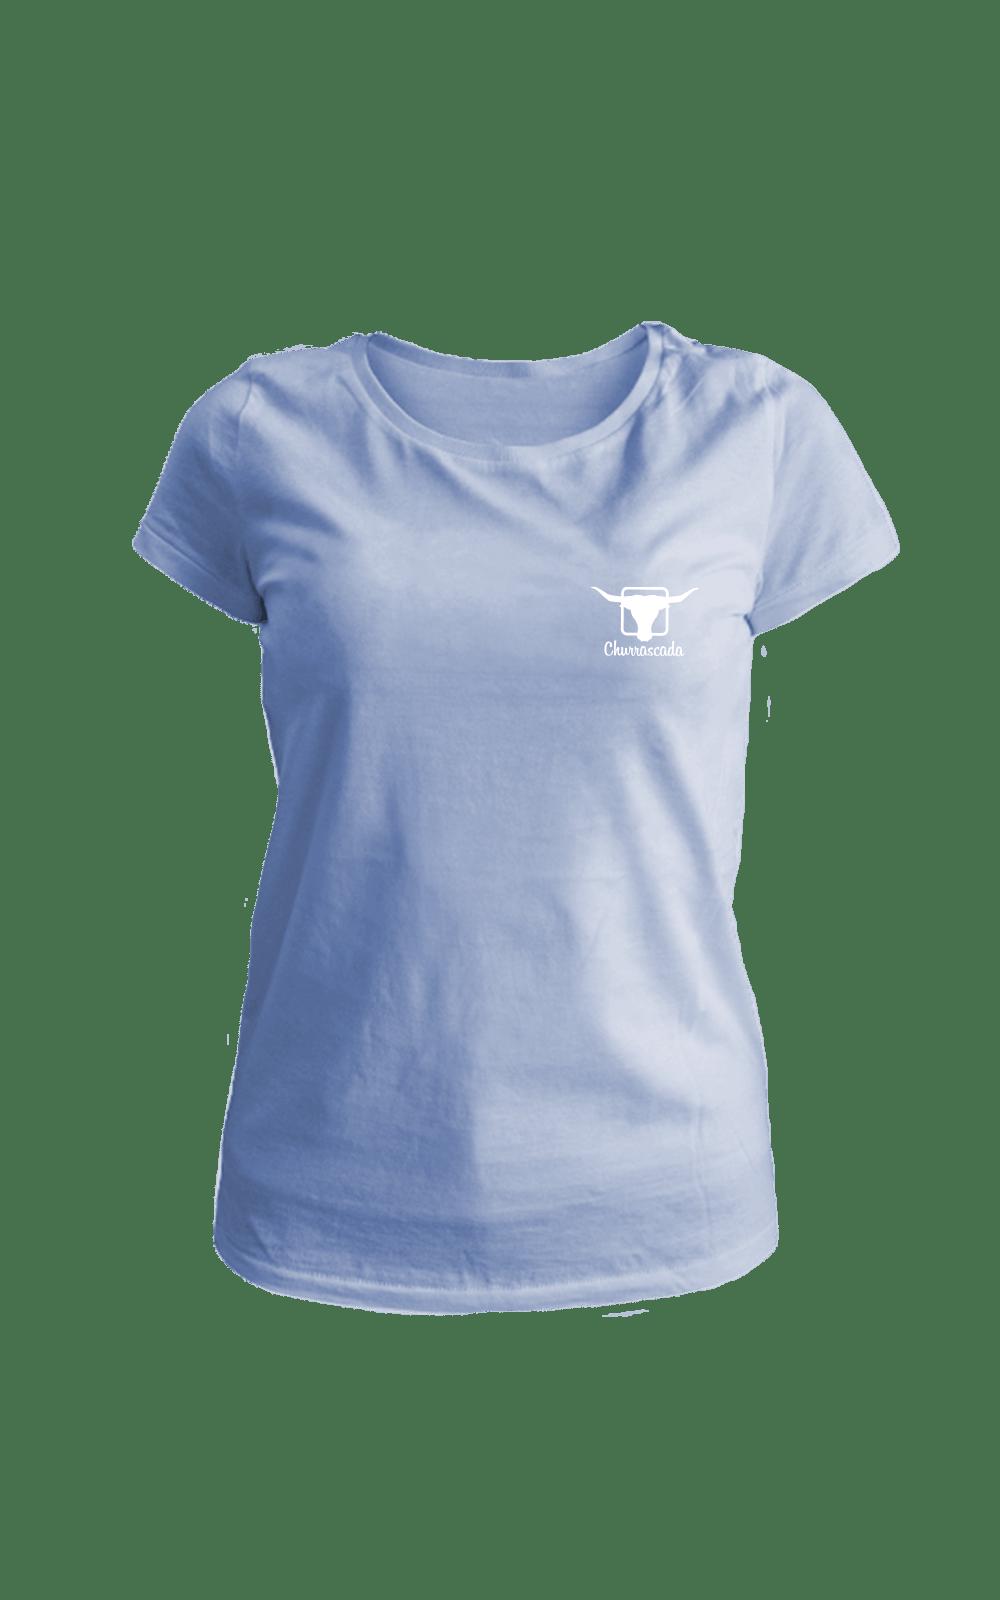 Camiseta_BabyLook_Churrascada_LogoWhite_SoftBlue_Frente